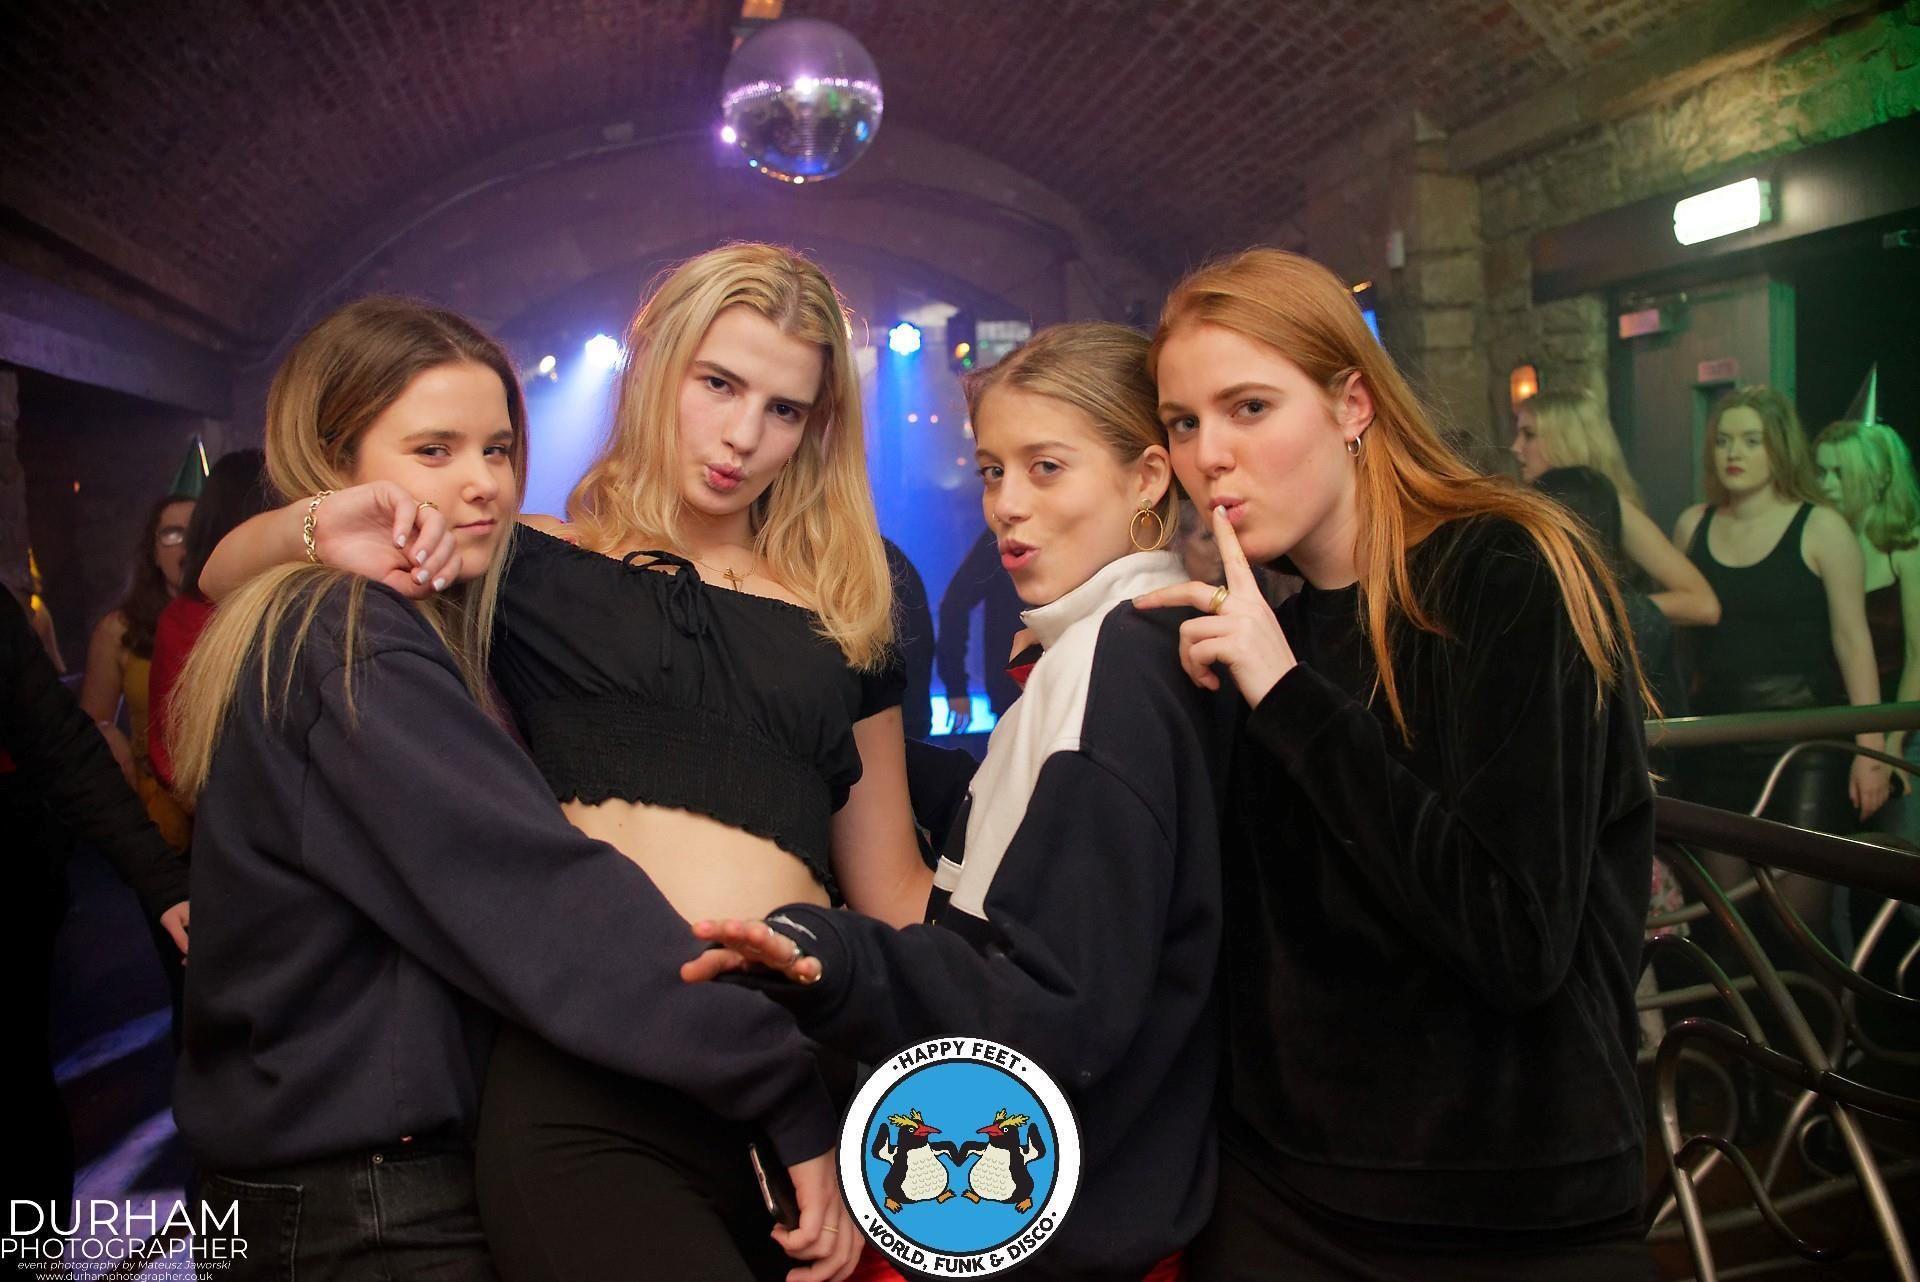 Image may contain: Night Club, Fashion, Club, Apparel, Clothing, Person, Human